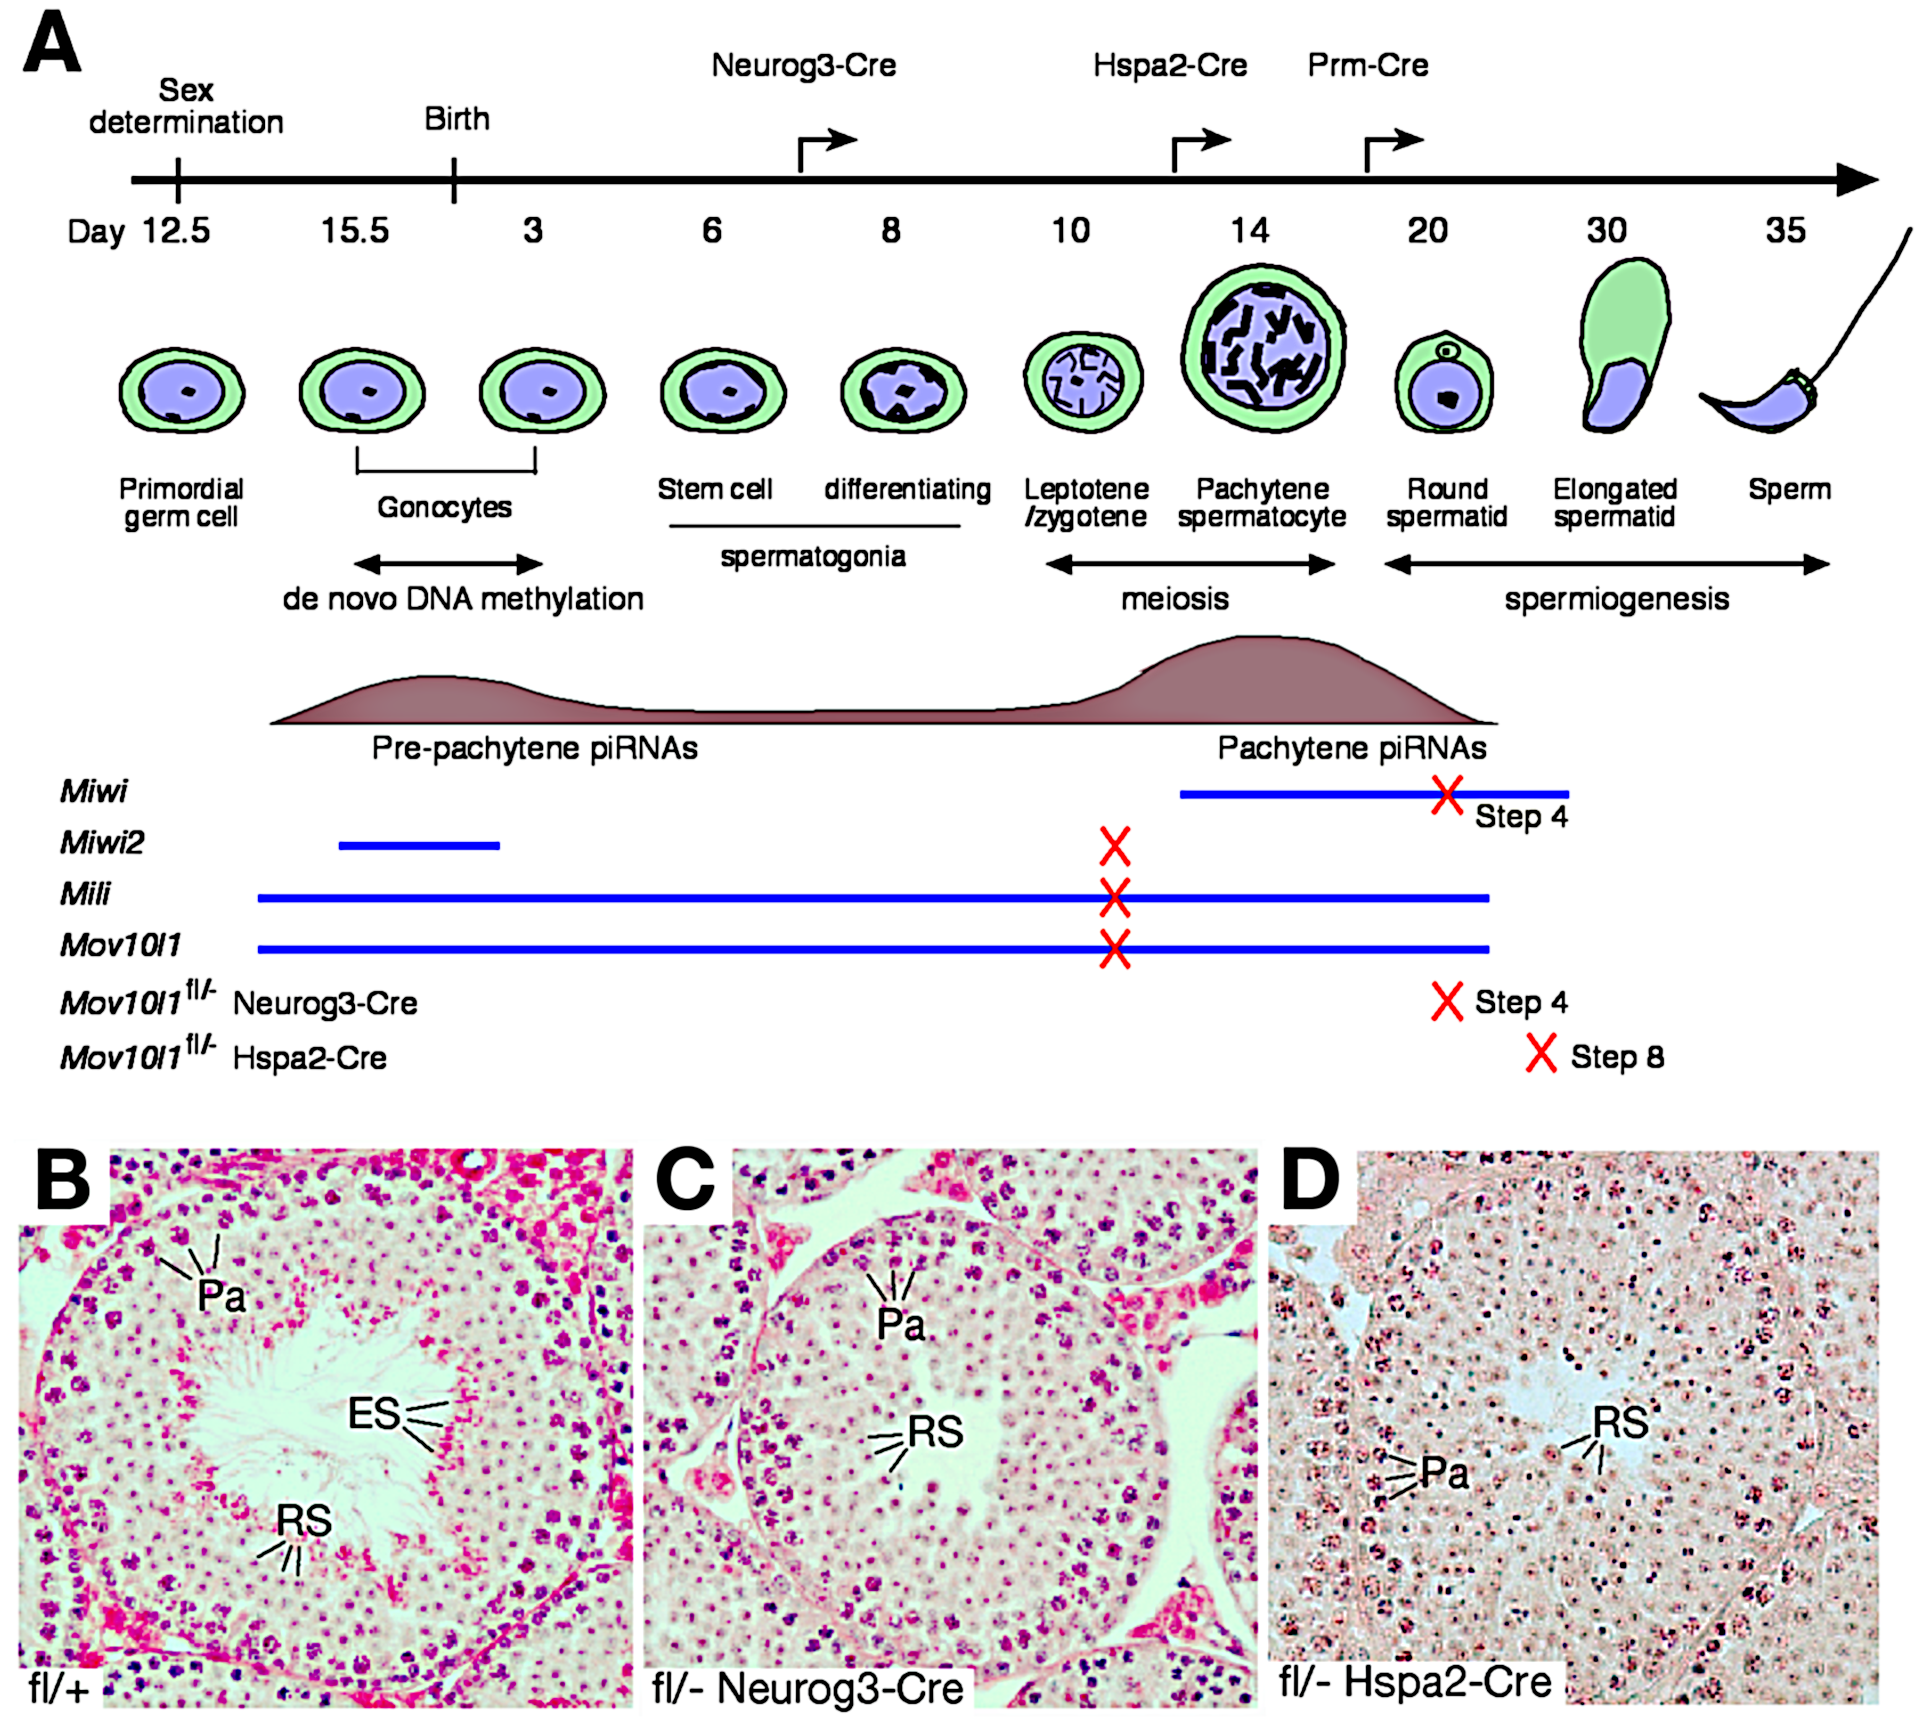 Post-natal disruption of <i>Mov10l1</i> leads to post-meiotic spermiogenic arrest.